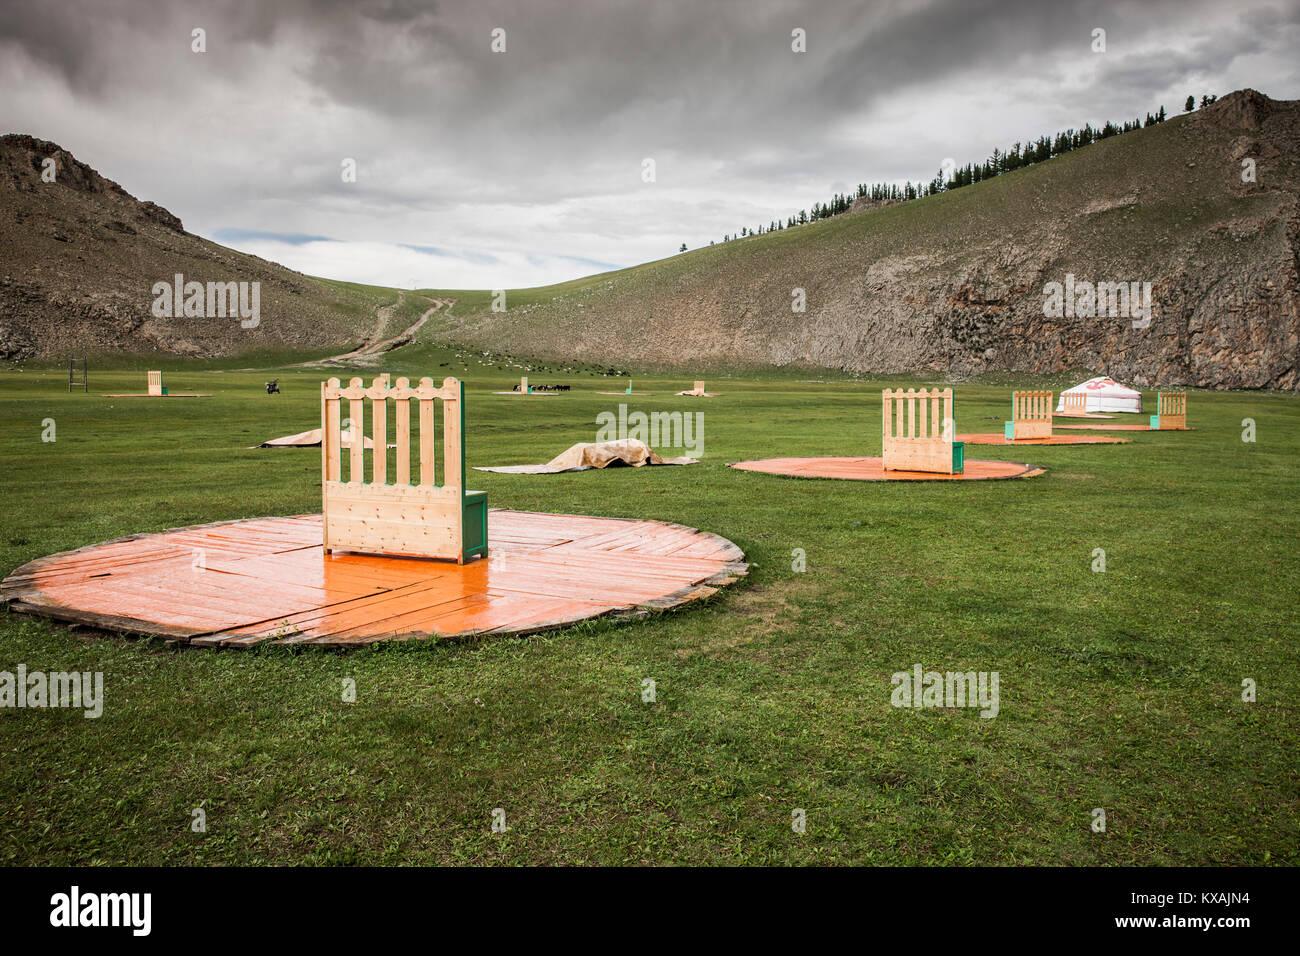 Dismantled ger (yurt) camp at end of 2017 Summer Trip, Bunkhan, Bulgan, Mongolia - Stock Image